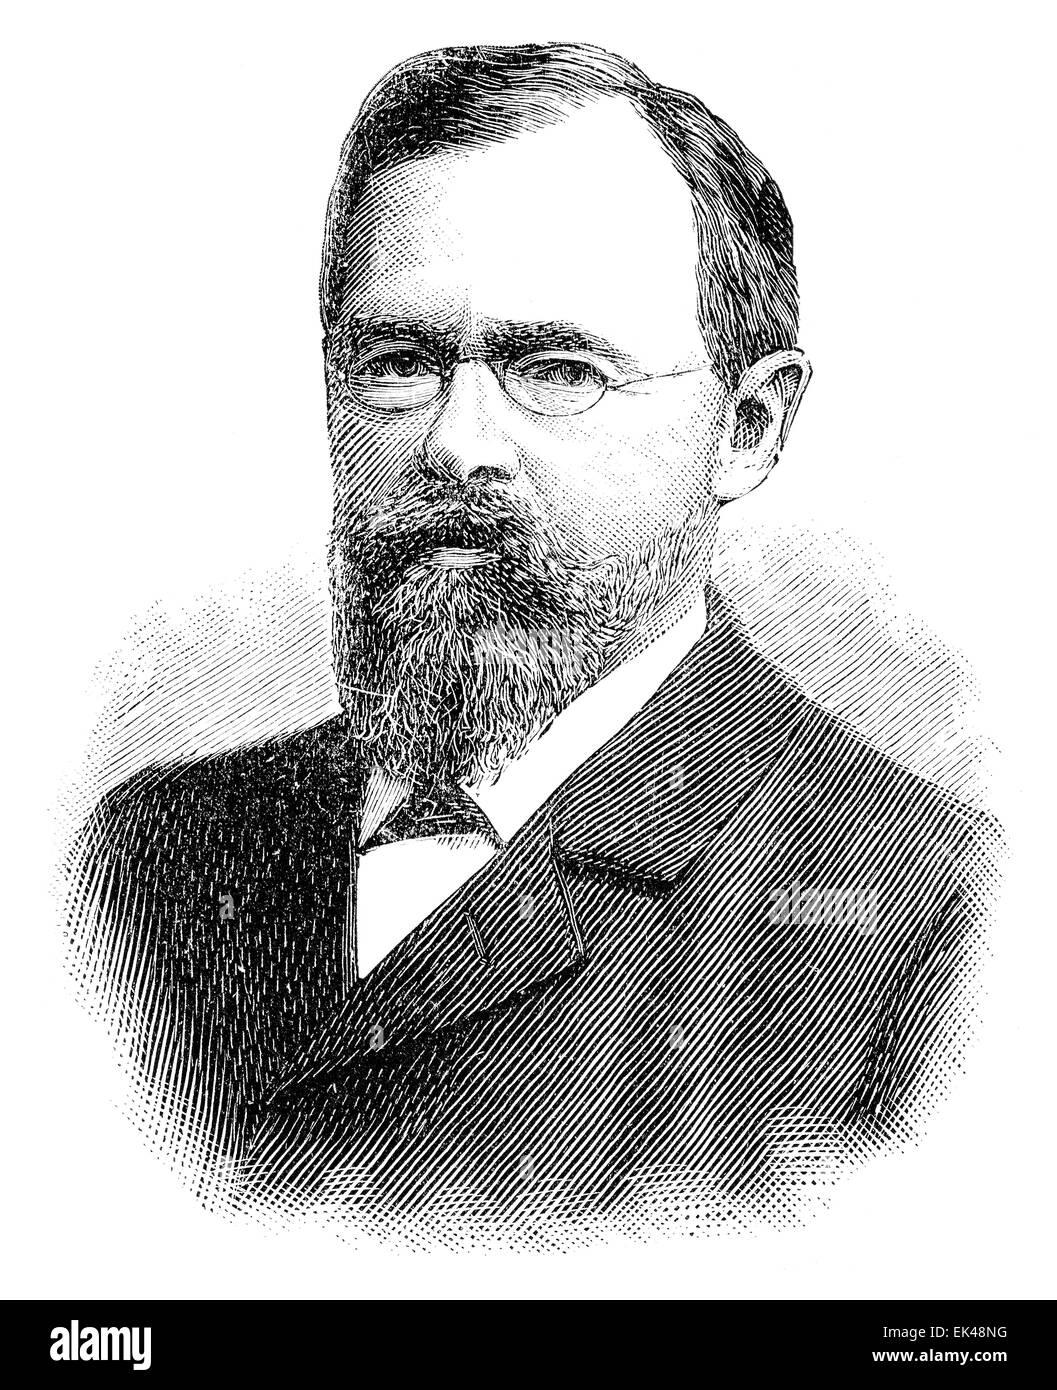 Carl Paul Gottfried Linde, Ritter von Linde, 1842 - 1934, a German engineer - Stock Image